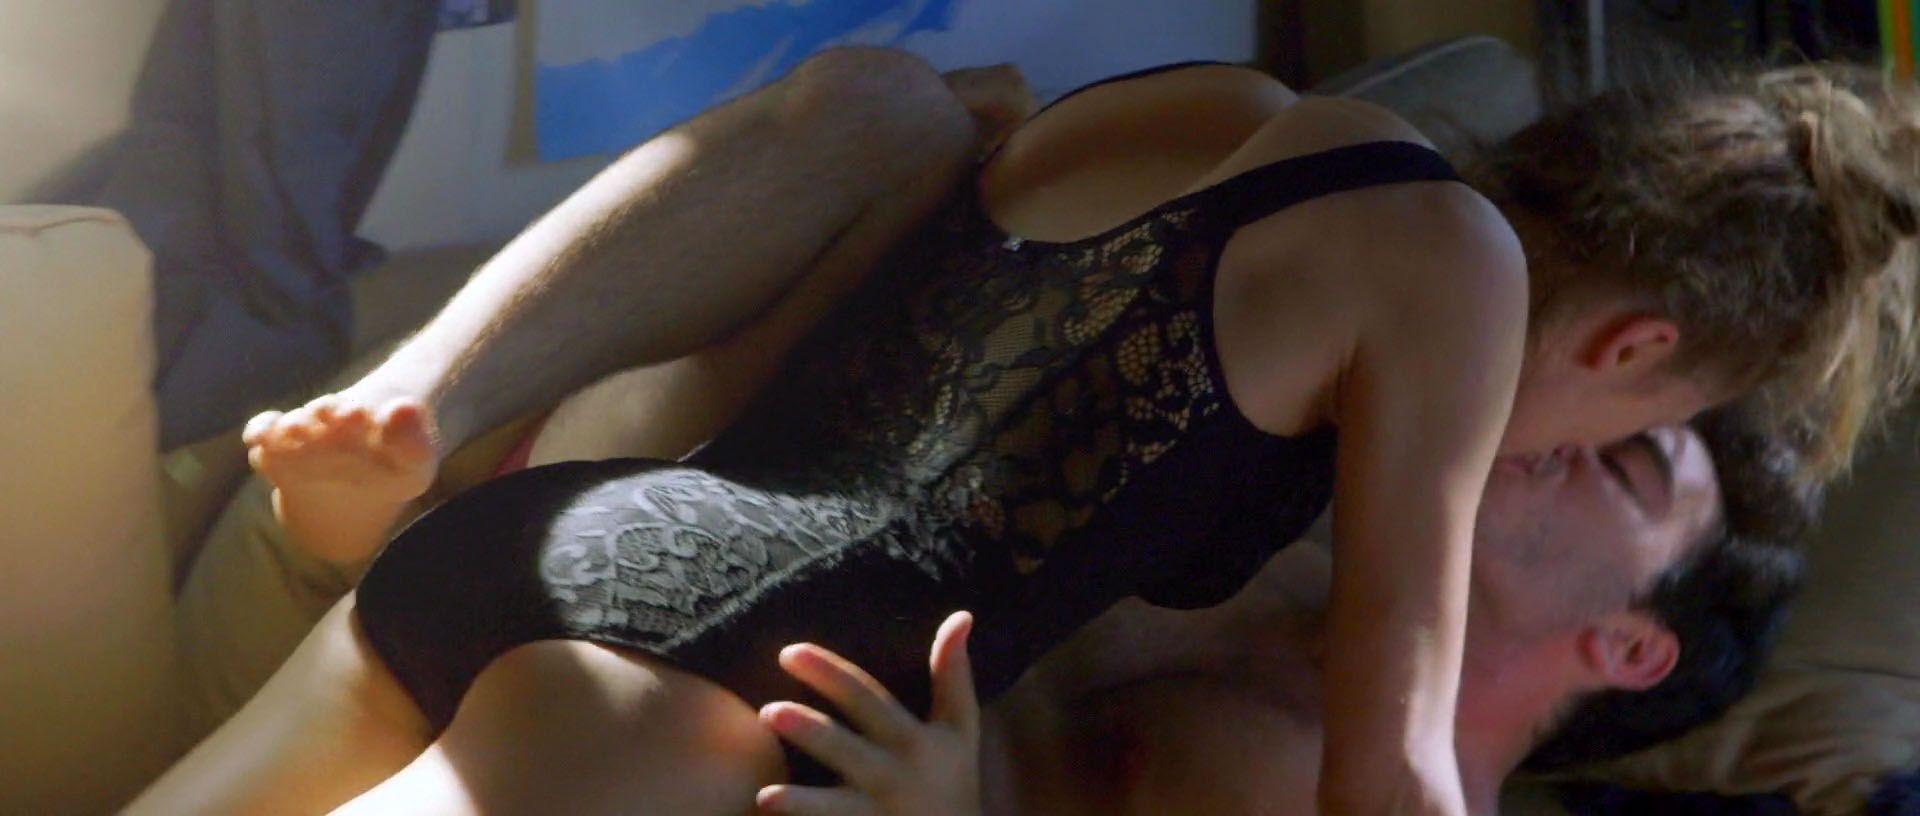 Lindsey-Shaw-Nude-3